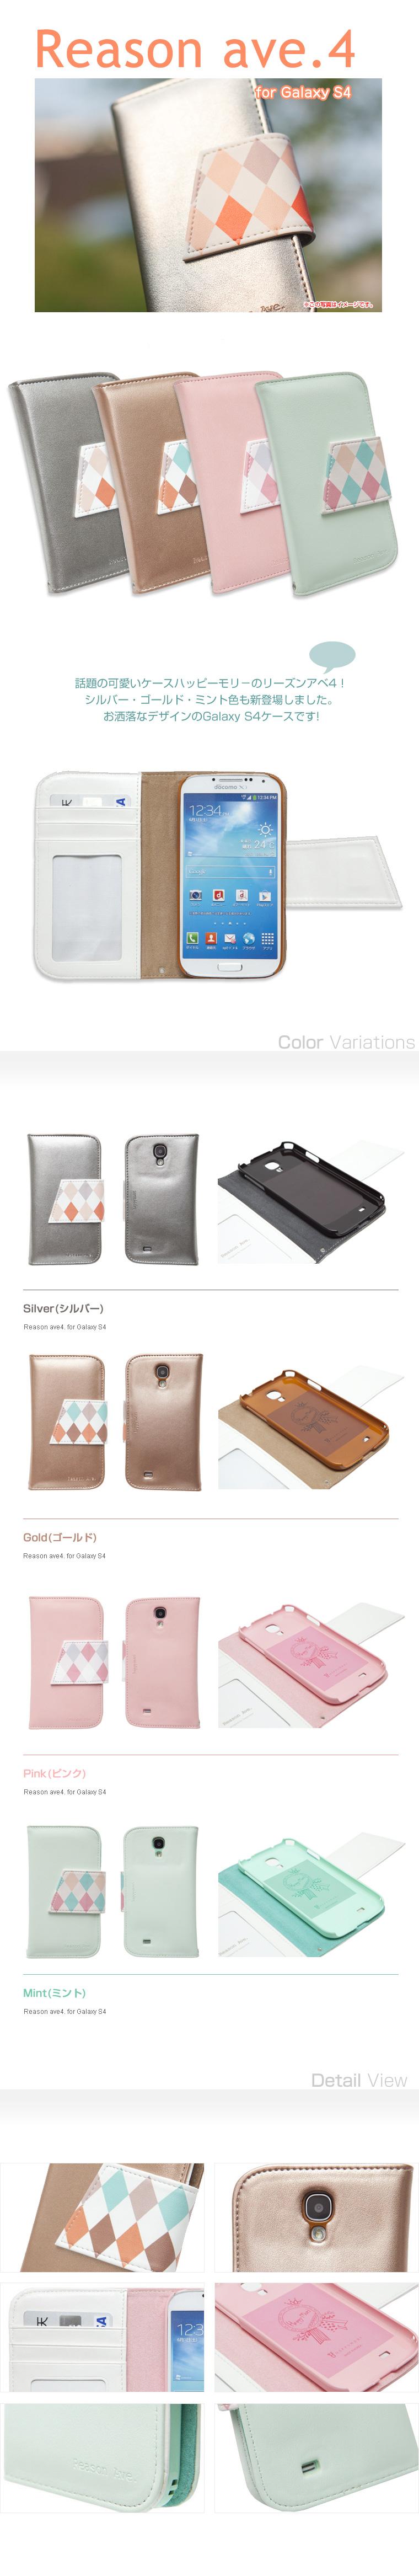 Galaxy S4 Reason ave.4 (リーズン アベニュー4)